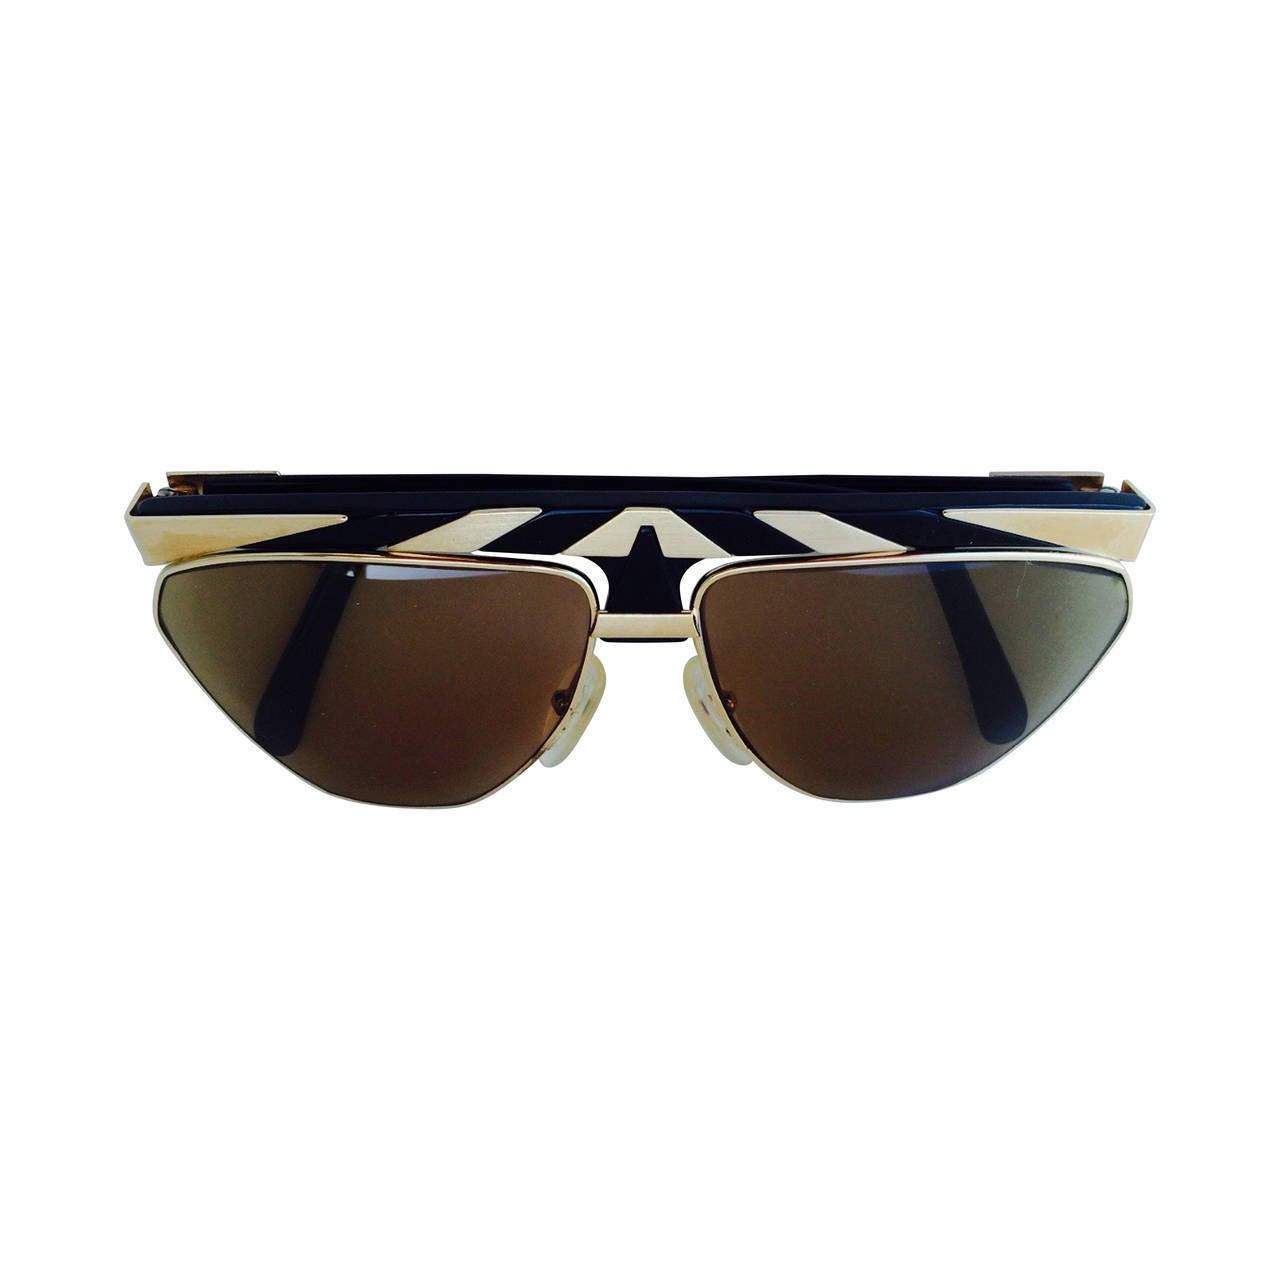 alpina sunglasses 1984 at 1stdibs